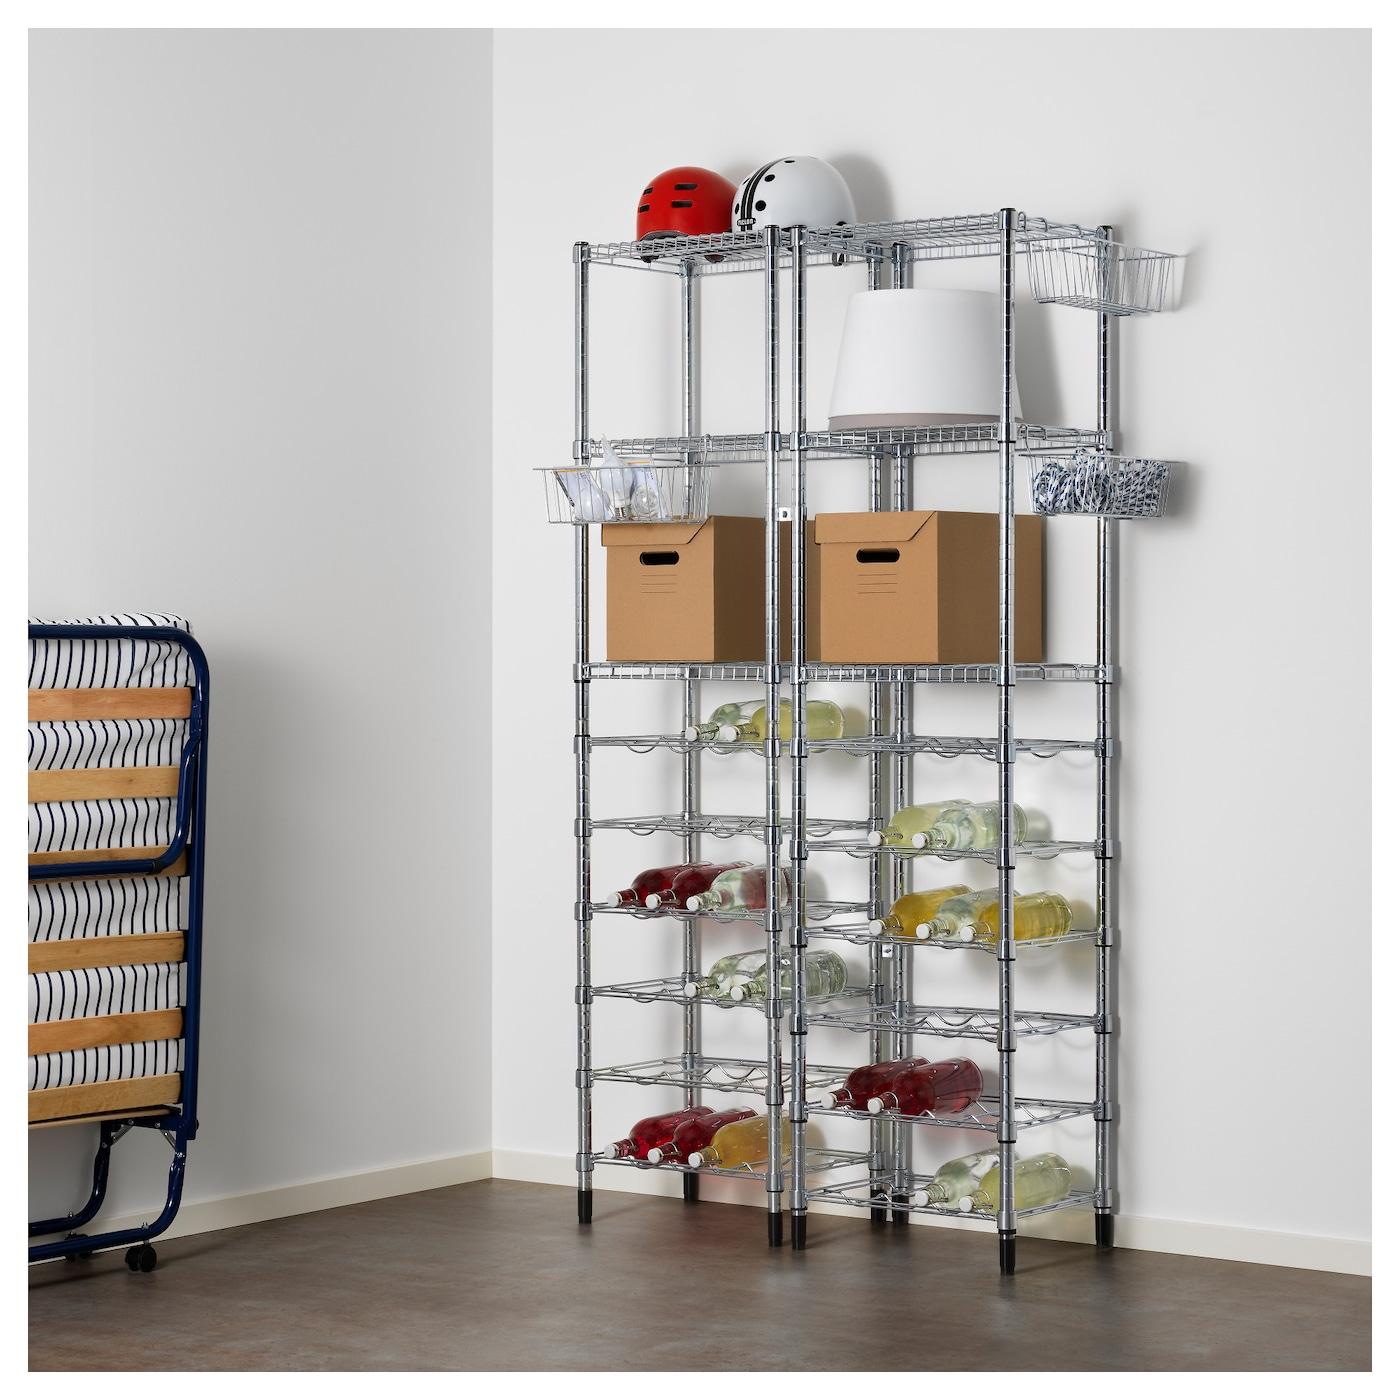 Ikea Kitchen Shelf Unit: OMAR 2 Shelf Sections 107x36x181 Cm